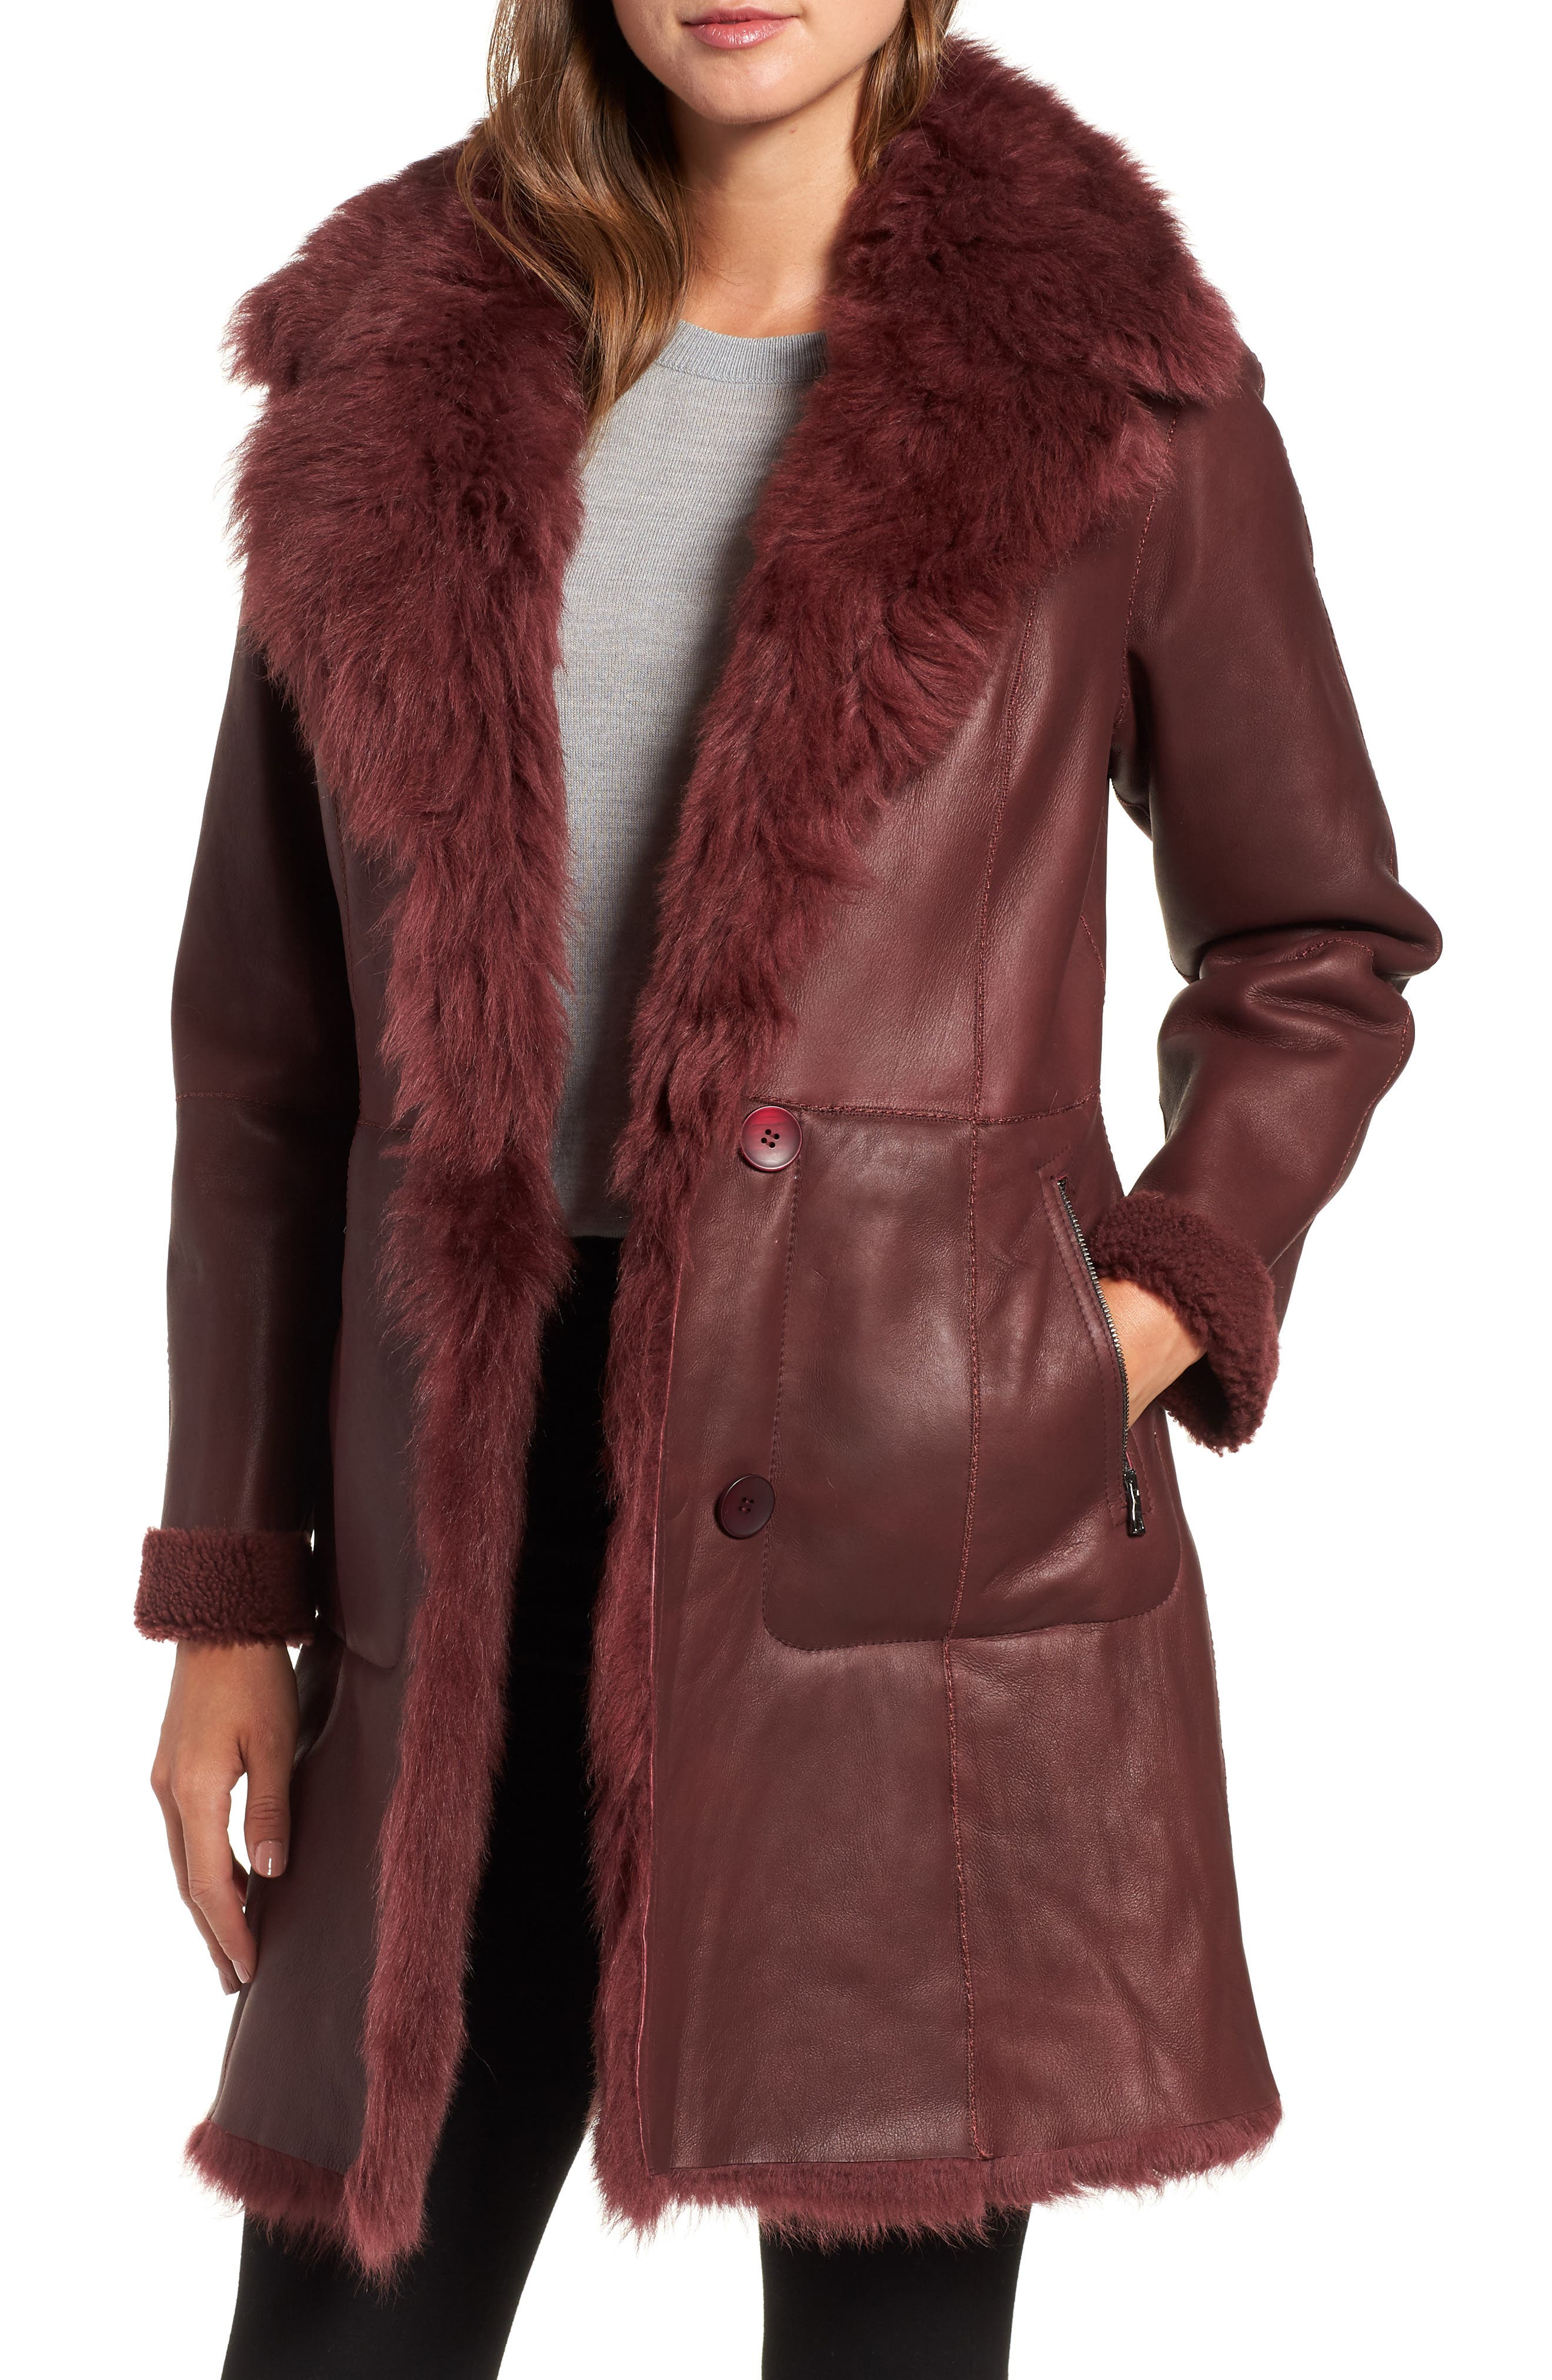 Hiso Reversible Genuine Shearling Coat, Burgundy